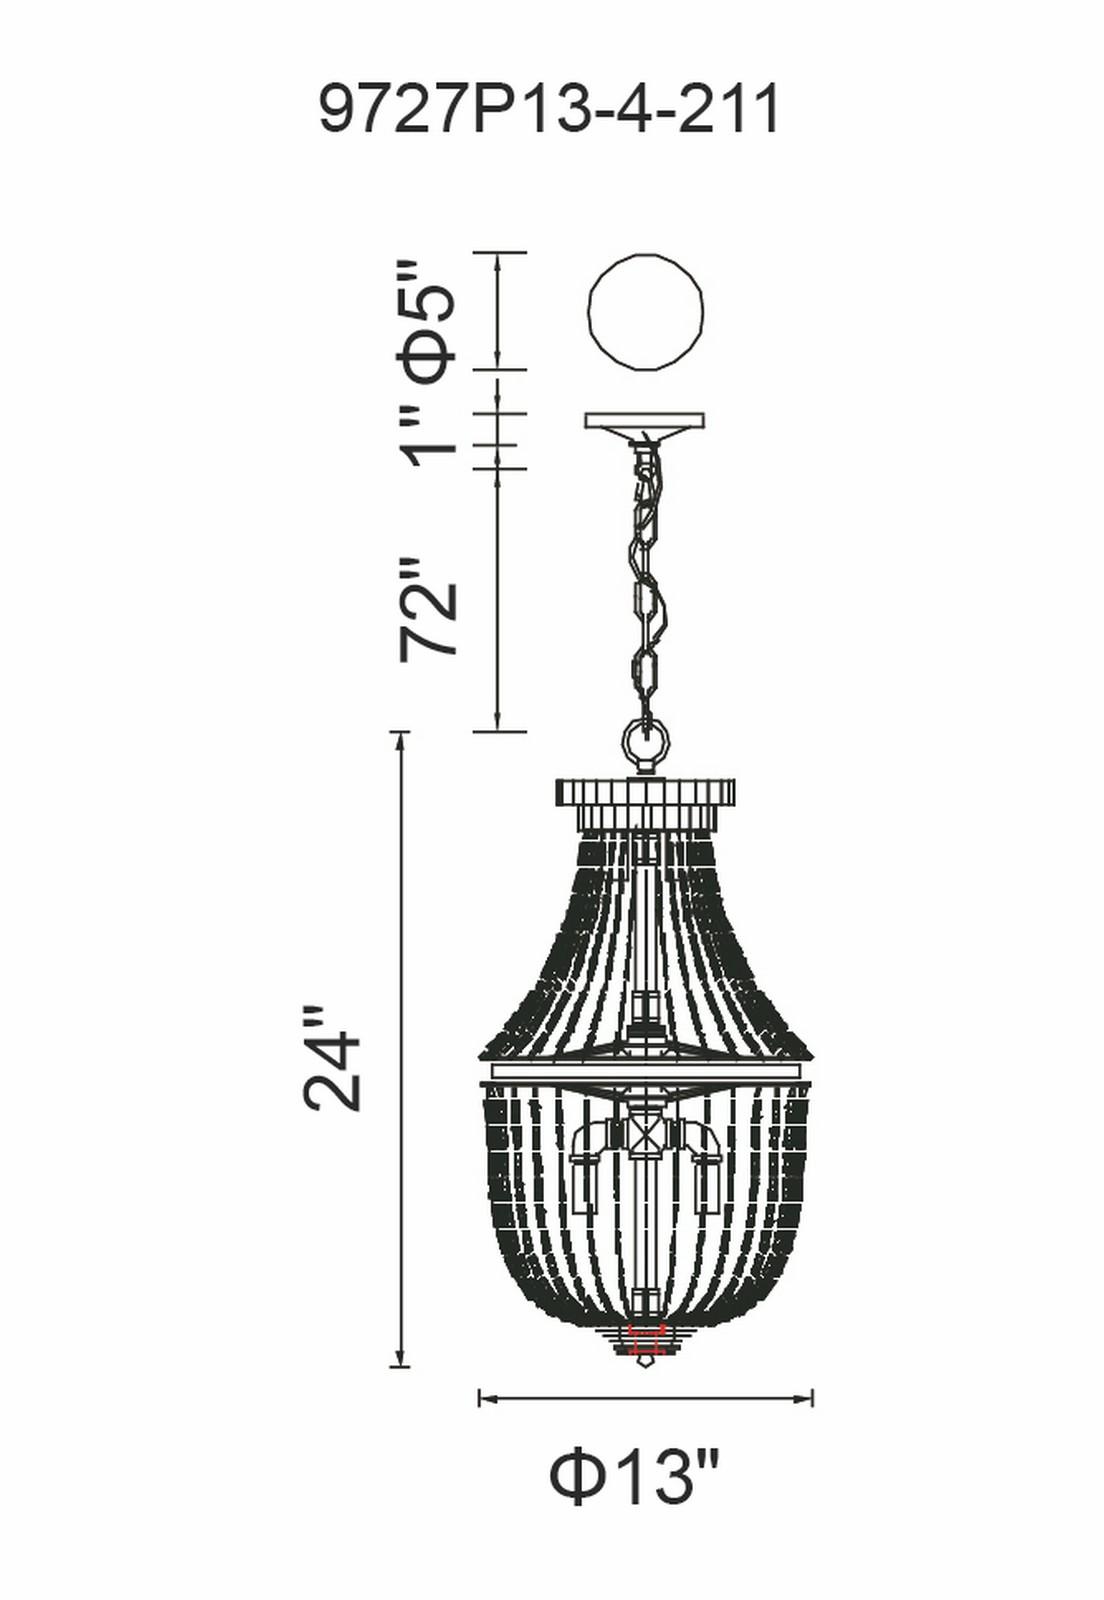 CWI Lighting Kala 4 Light Mini Chandelier With Antique Bronze Model: 9727P13-4-211 Line Drawing